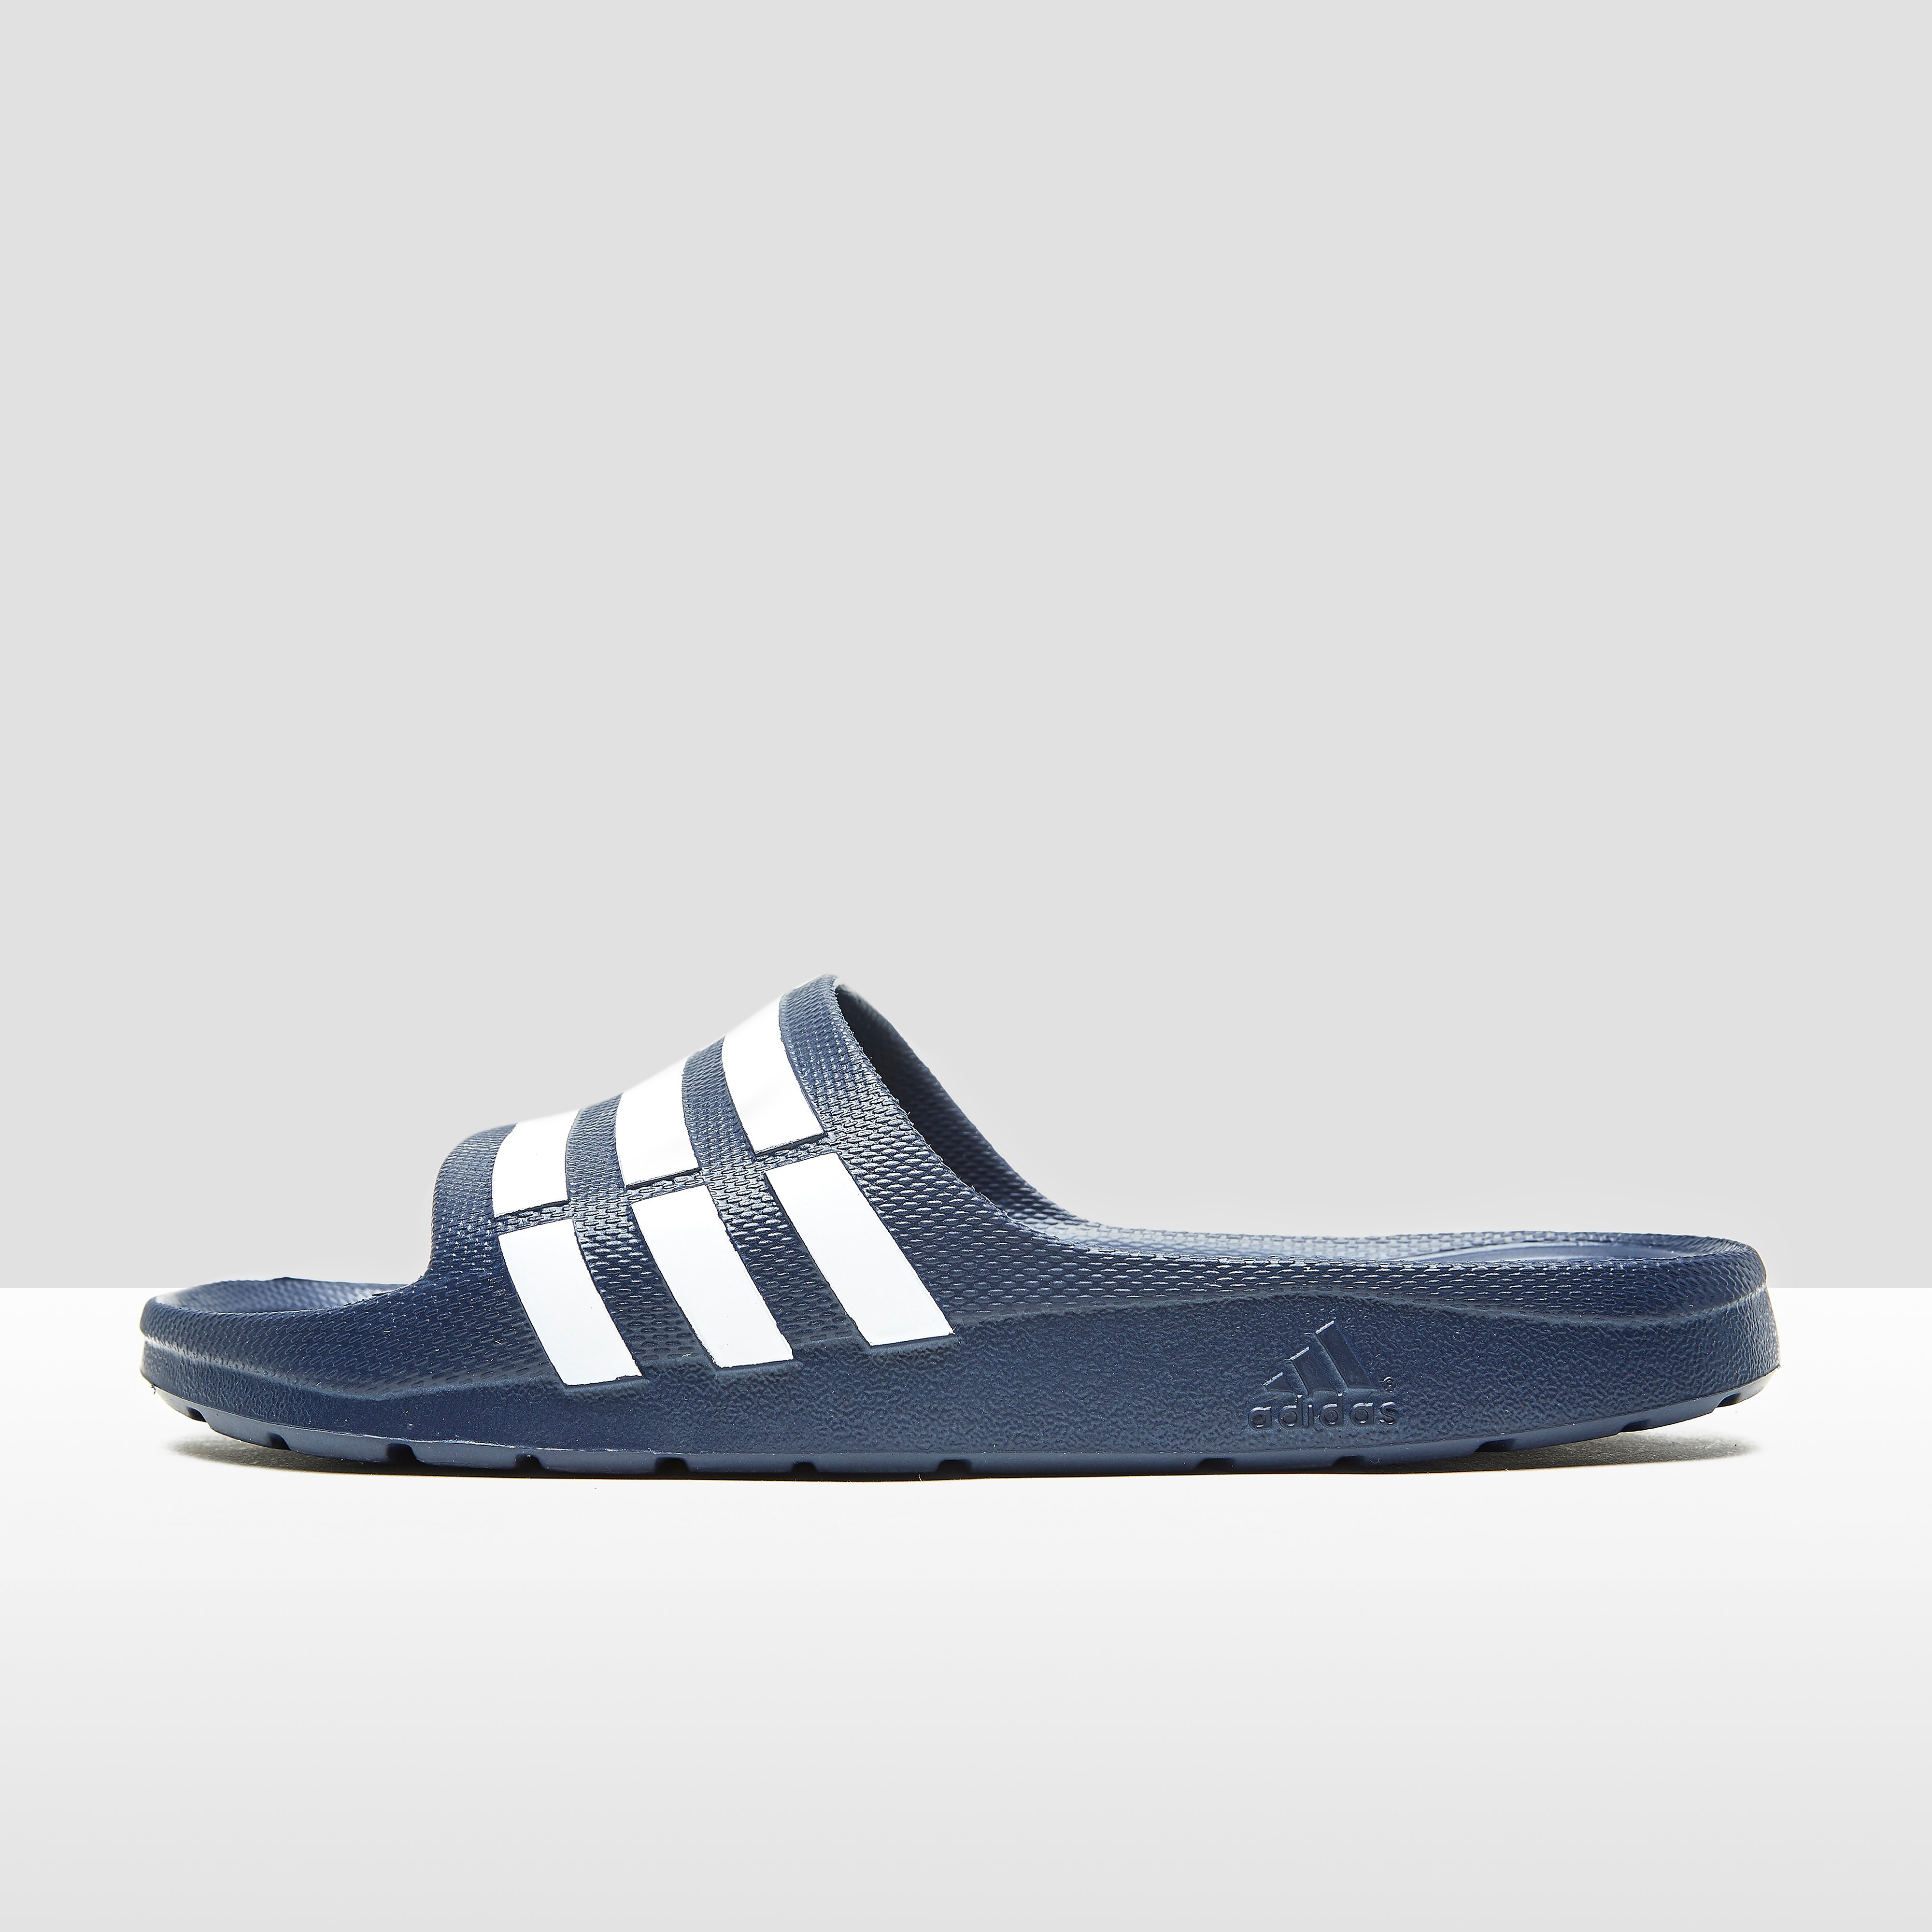 Adidas Duramo Slide blauw-wit EU 44 2-3 UK 10